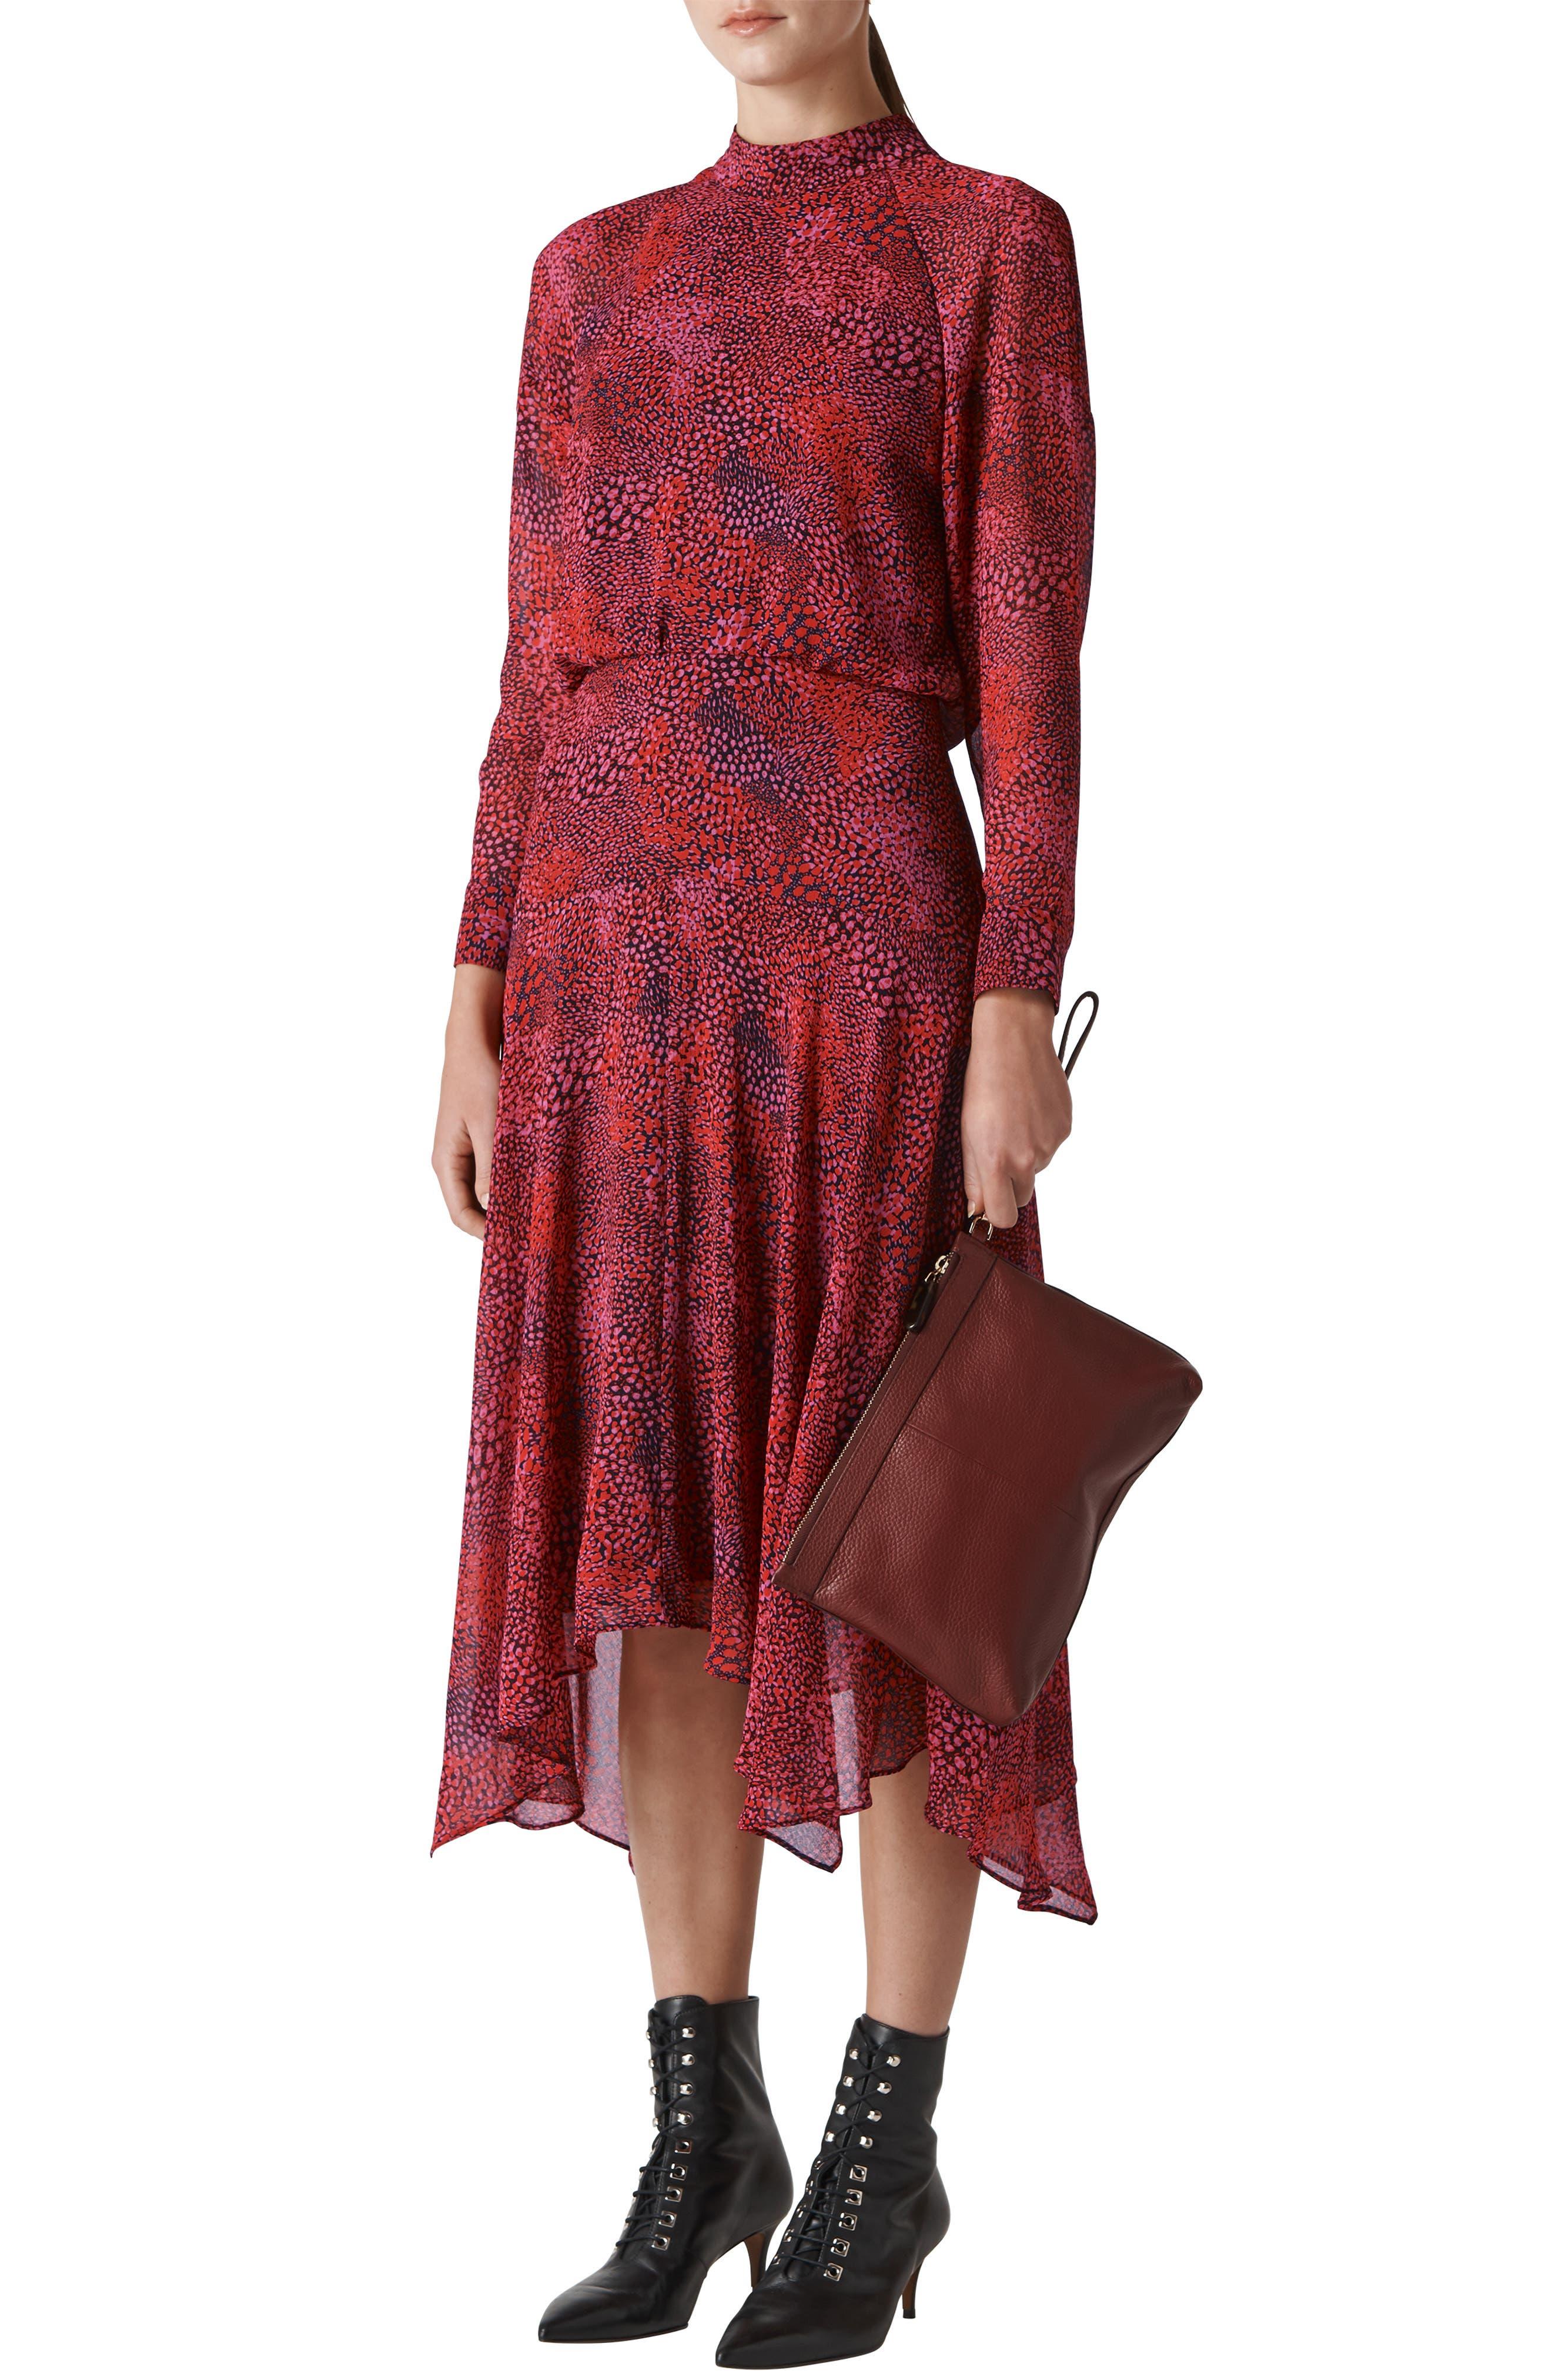 WHISTLES Carlotta Abstract Animal Print Dress, Main, color, PINK/ MULTI